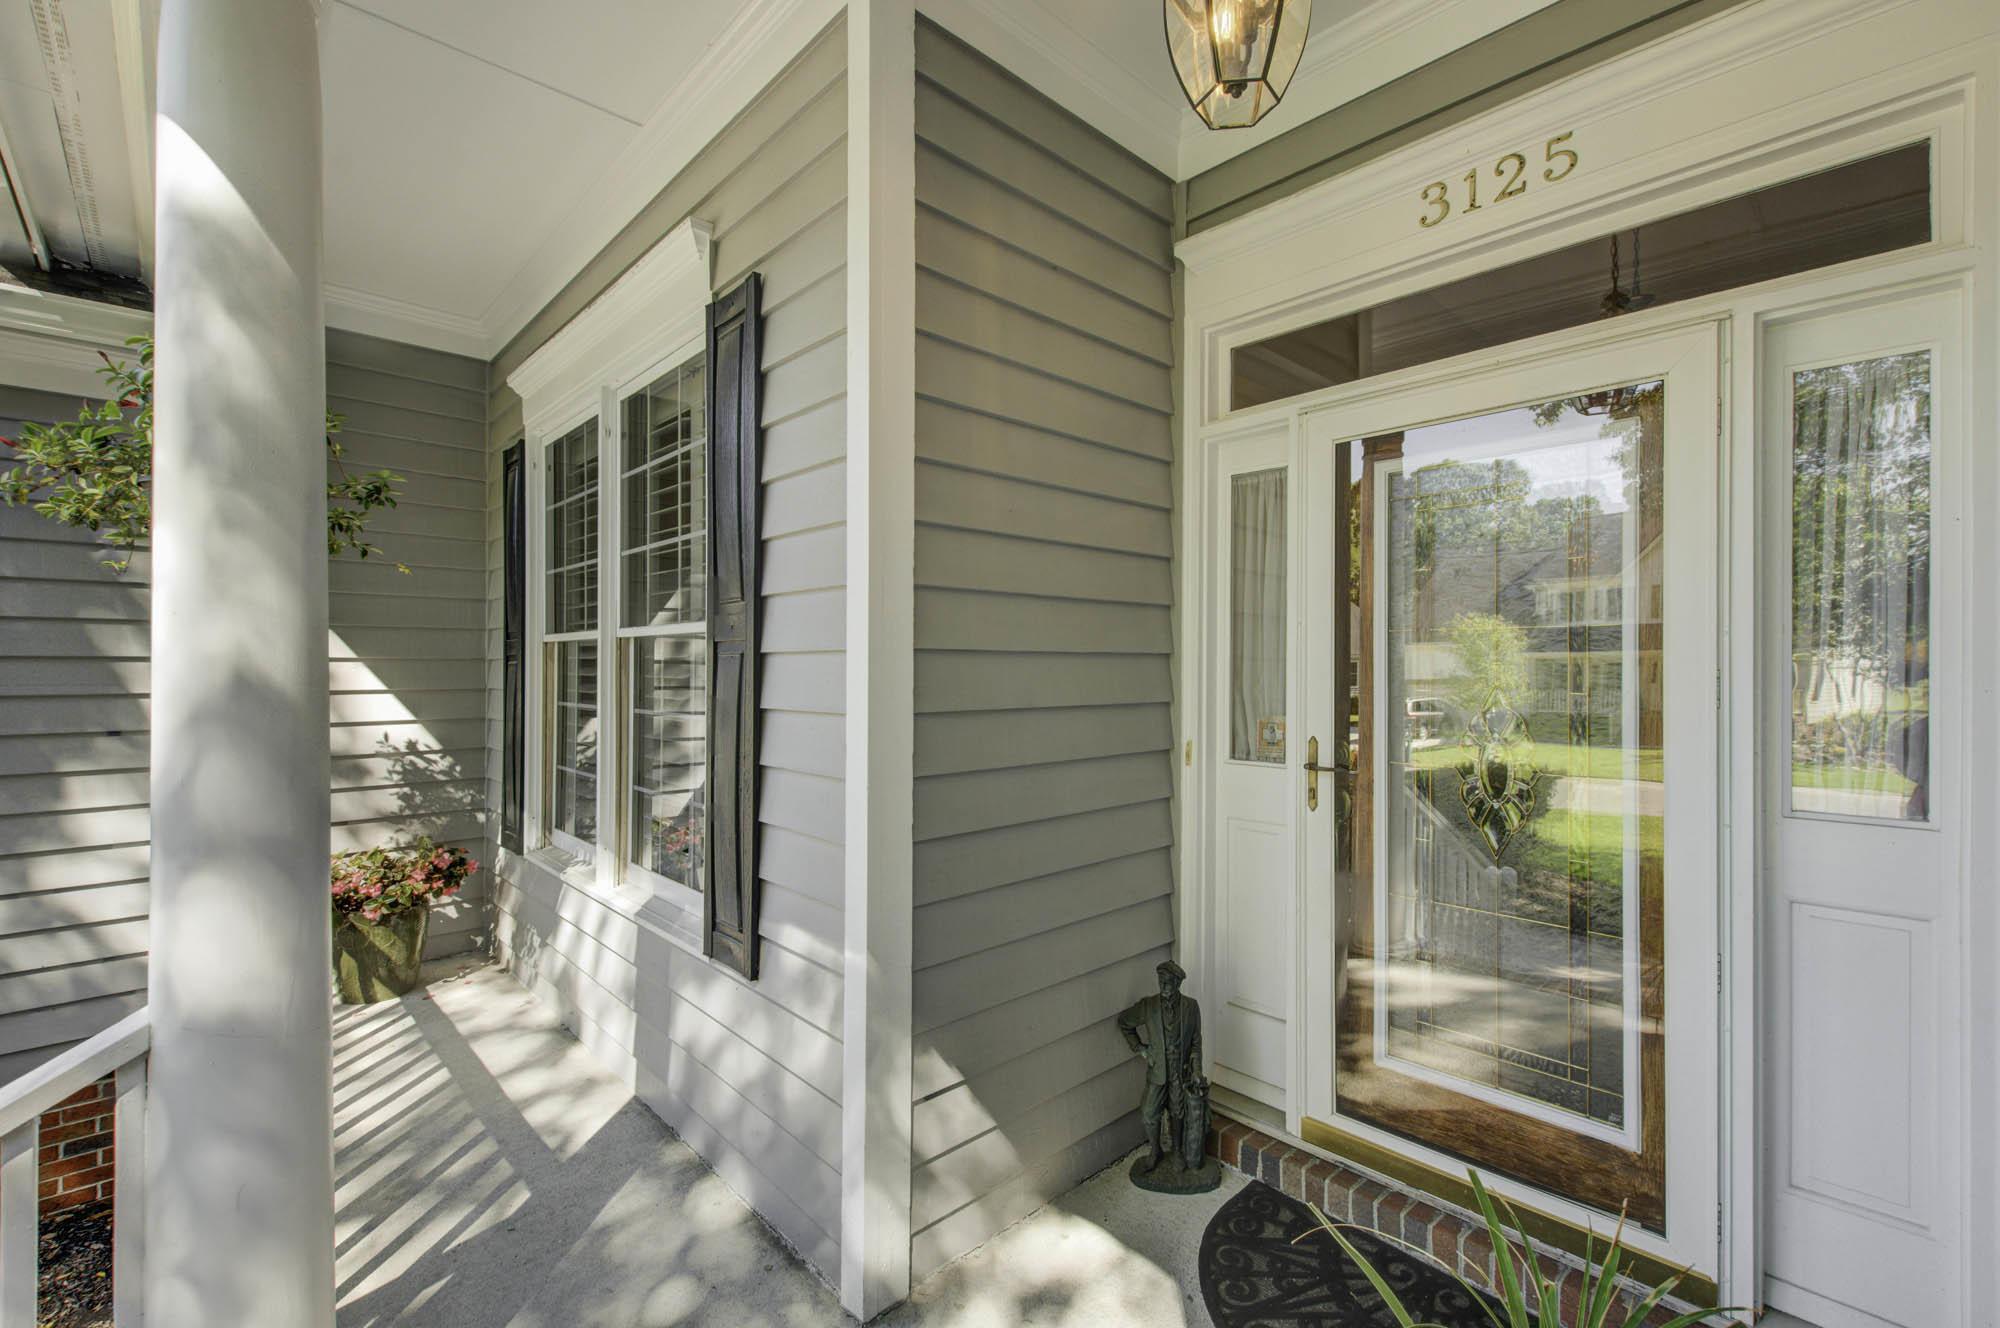 Charleston National Homes For Sale - 3125 Linksland, Mount Pleasant, SC - 0